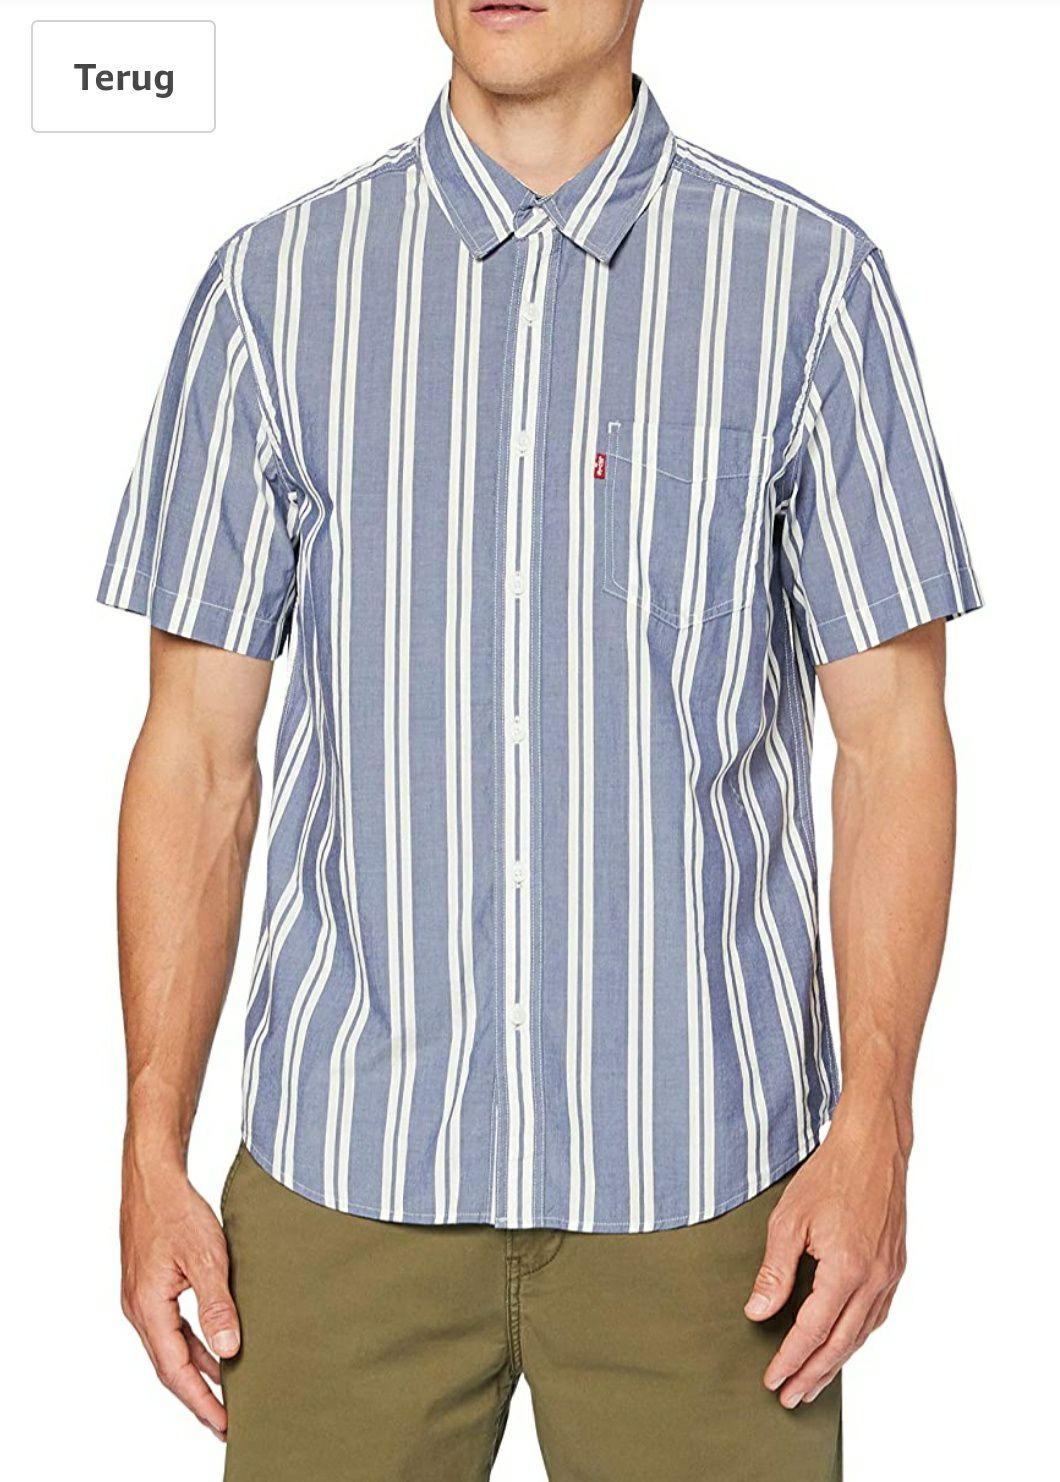 Levi's Sunset 1 Pocket Standard Heren Shirt